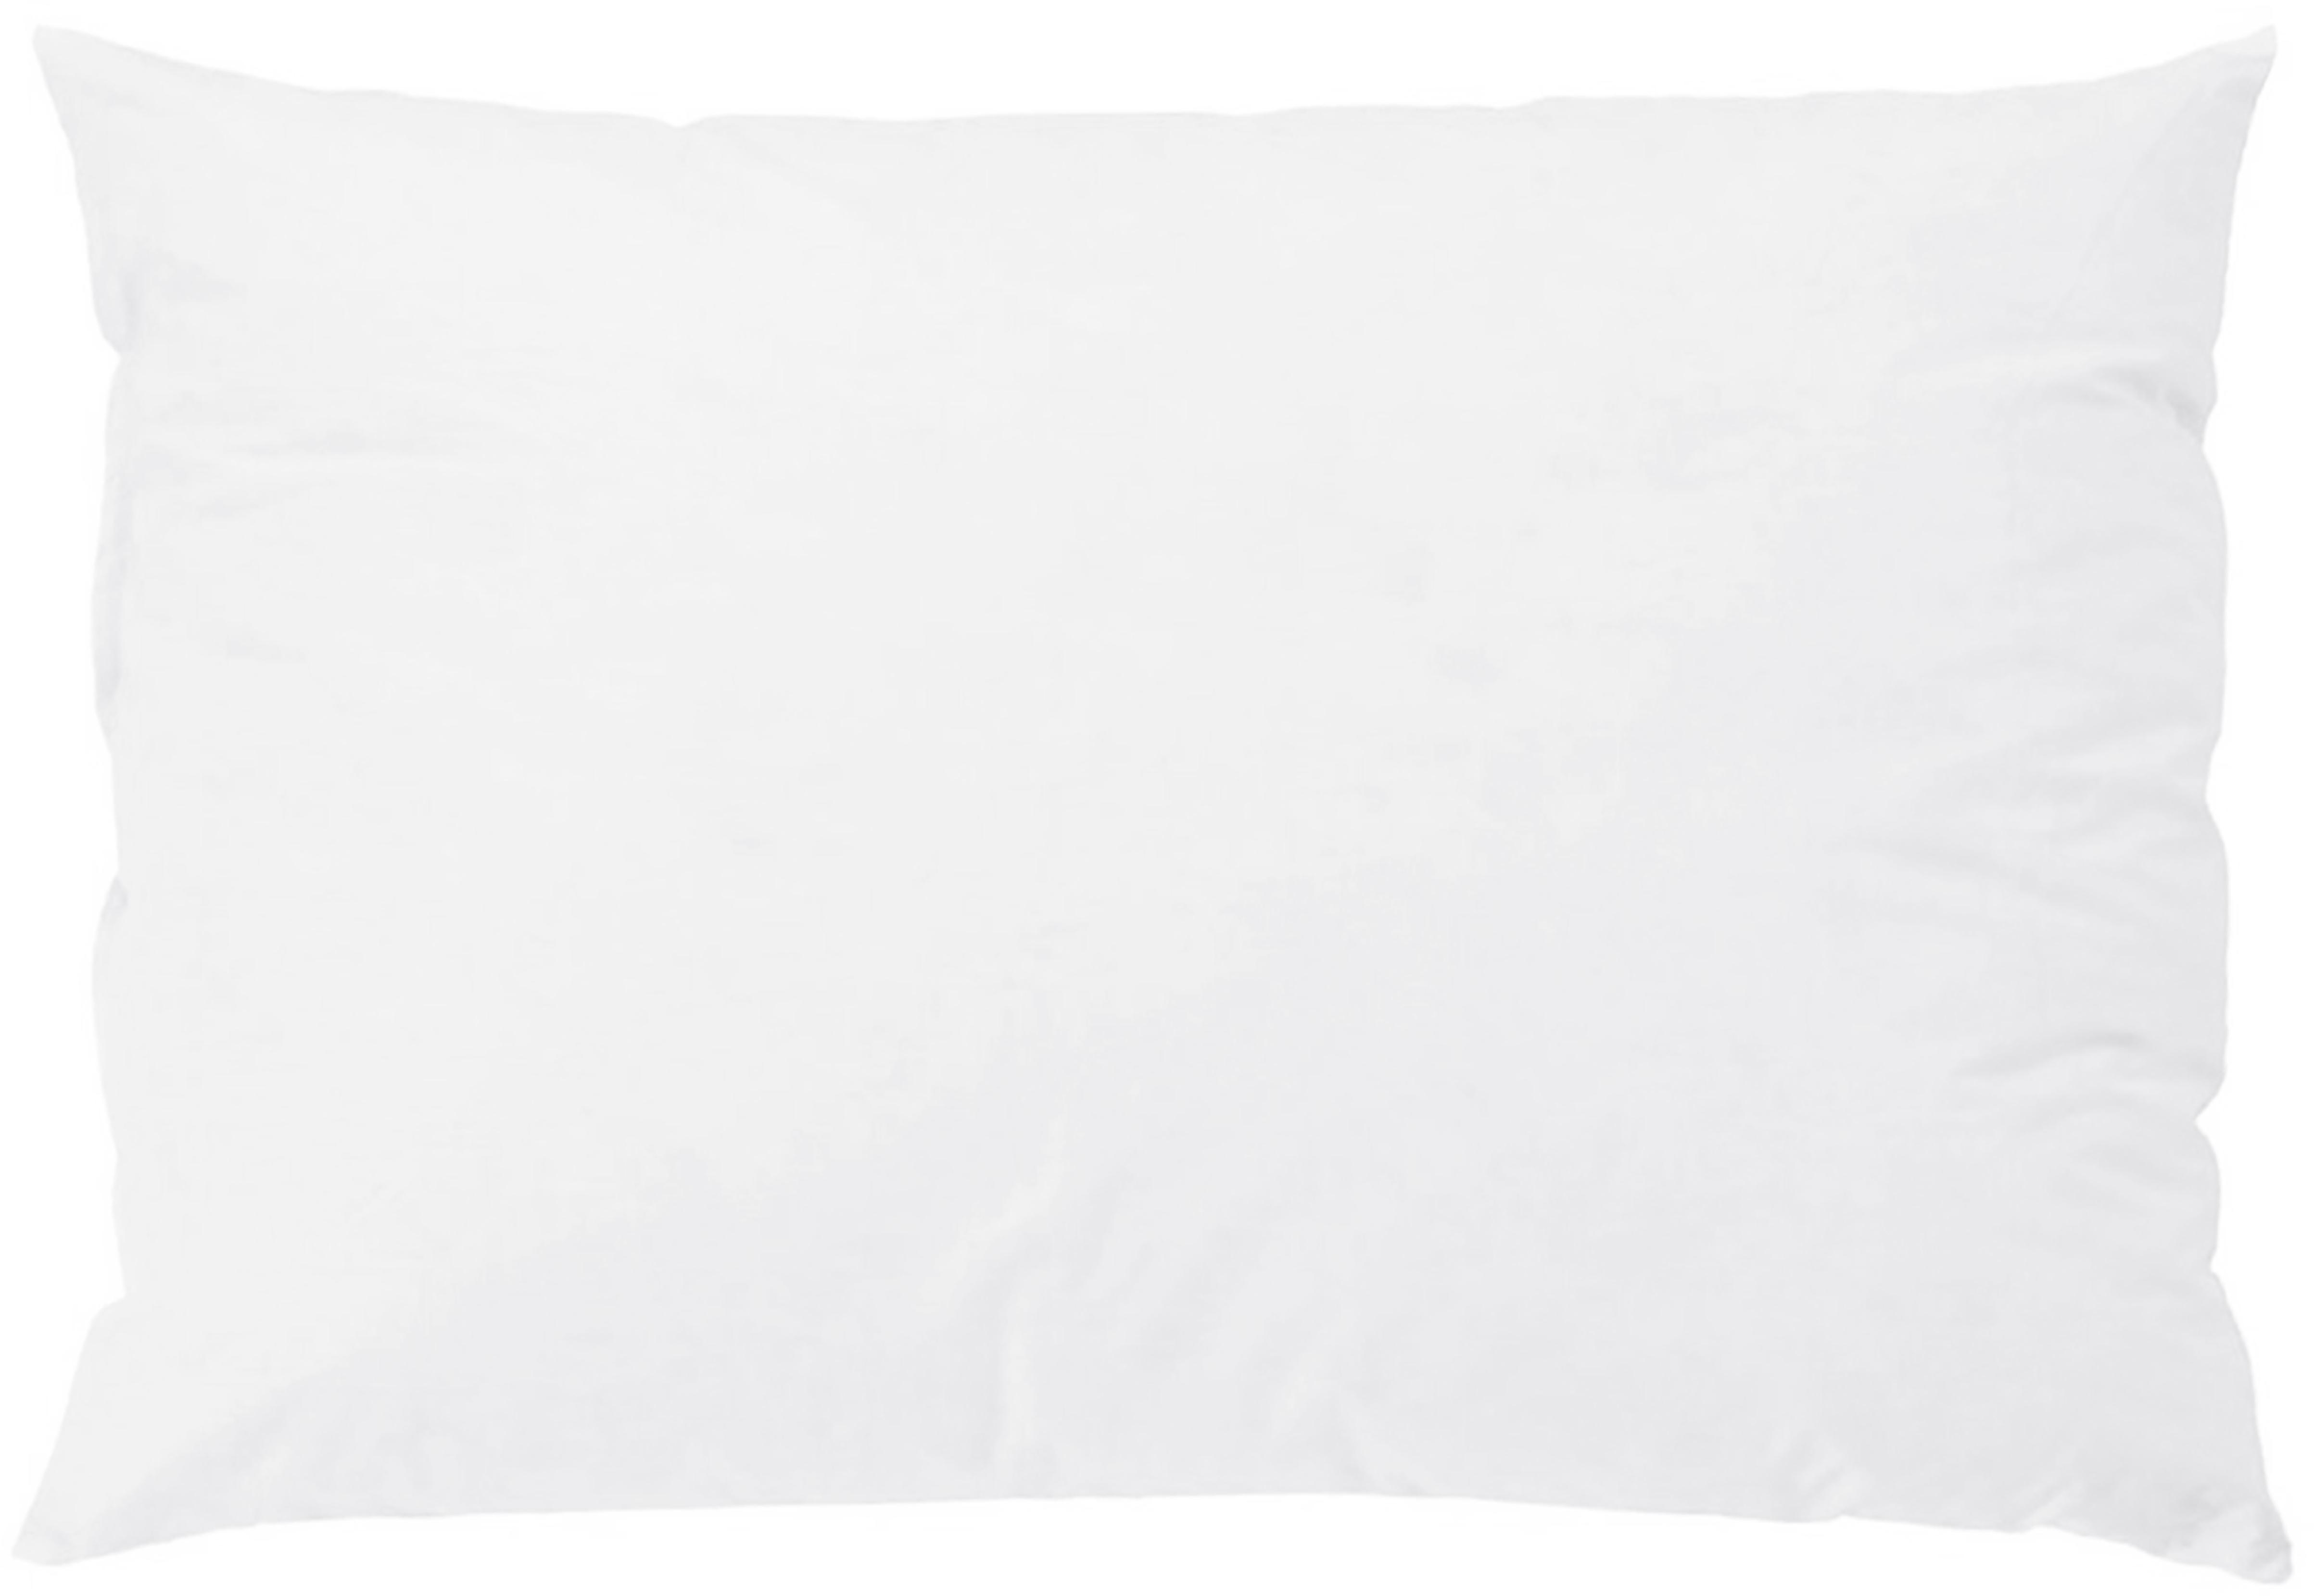 Relleno de cojín Komfort, 40x60, Funda: percal Mako, 100%algodón, Blanco, An 40 x L 60 cm